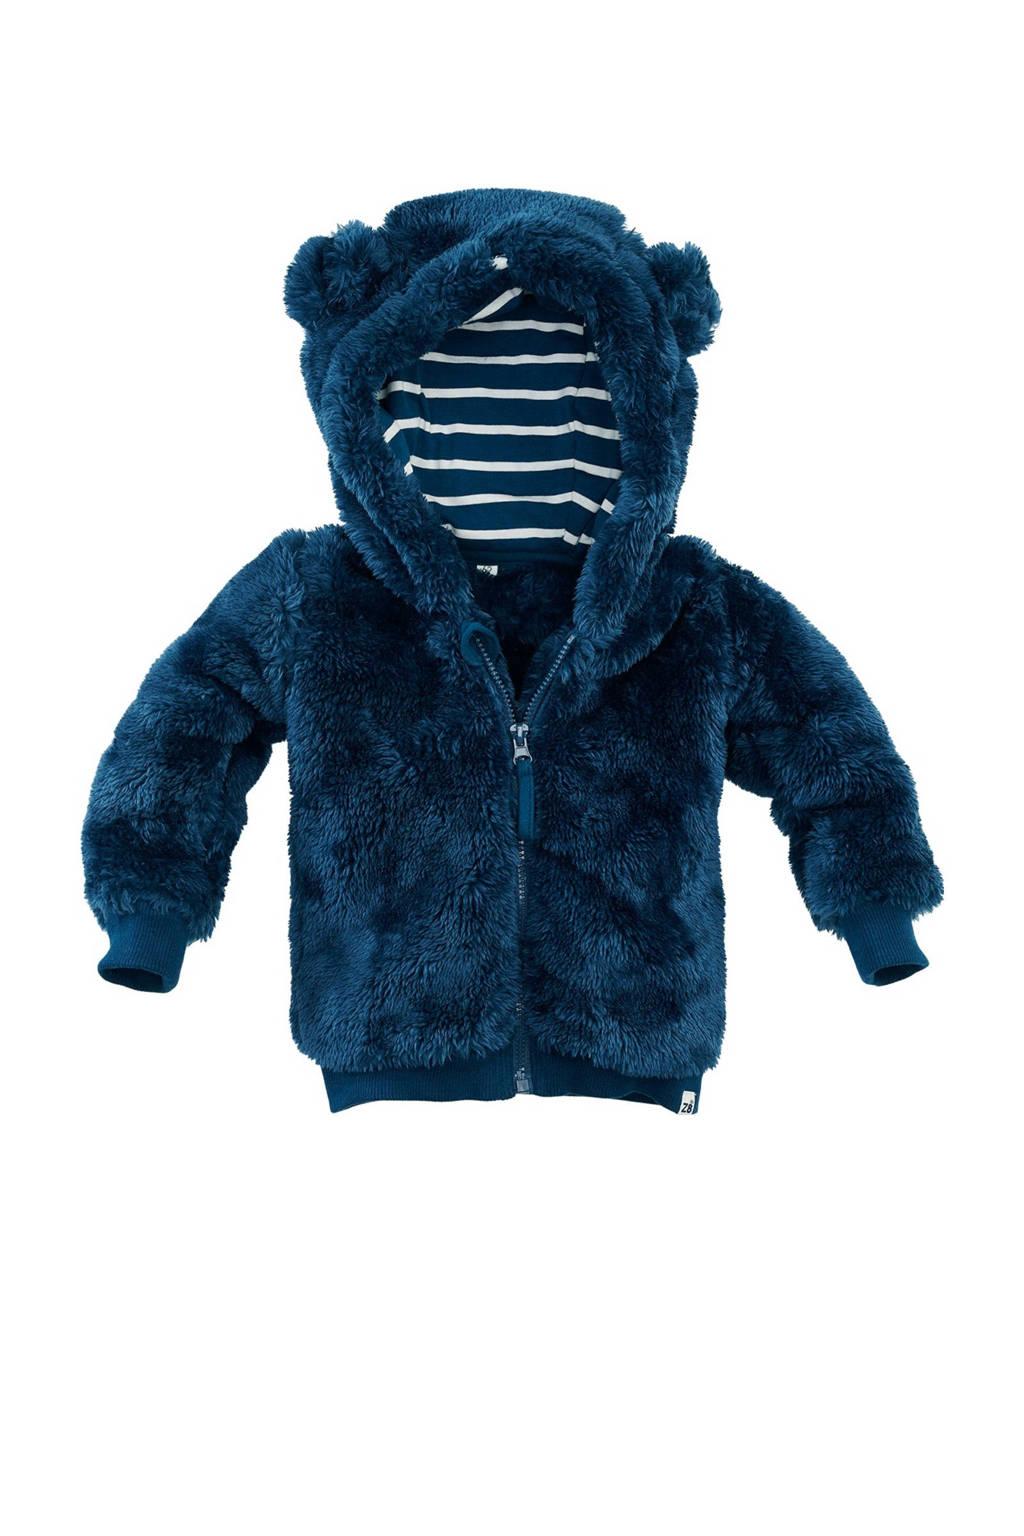 Z8 baby fleece vest Dallas donkerblauw/wit, Donkerblauw/wit